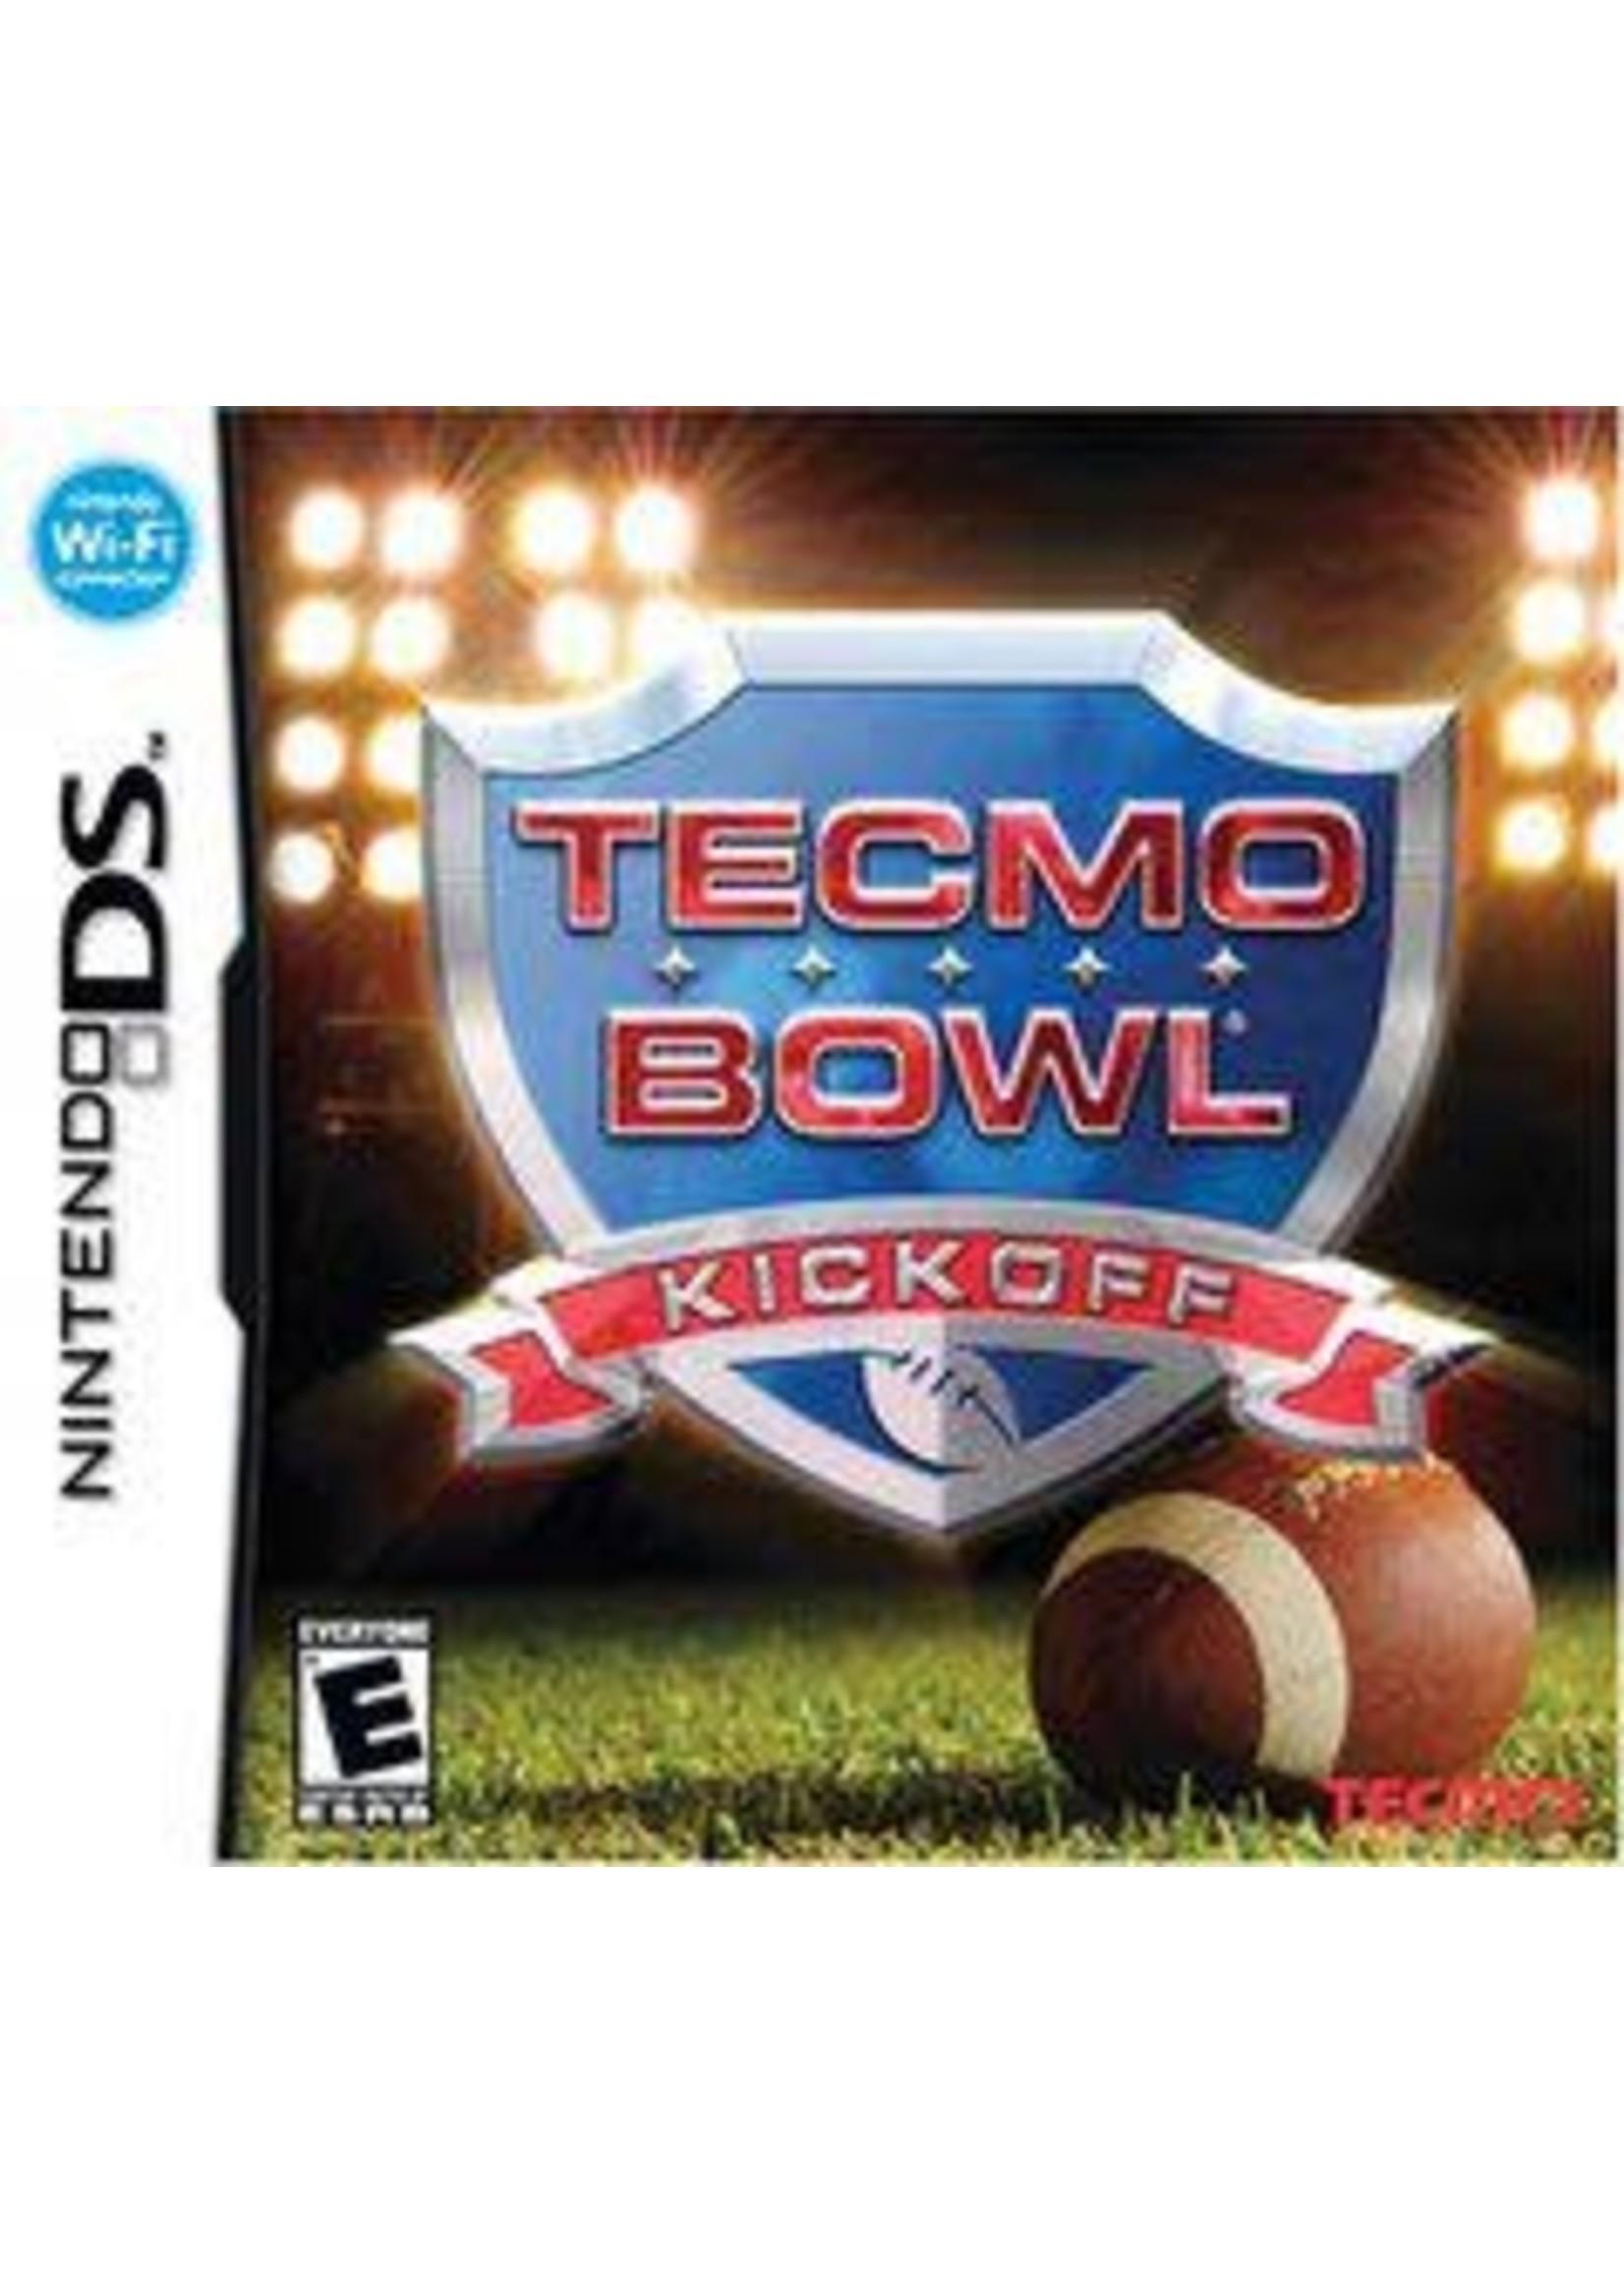 Tecmo Bowl Kickoff Nintendo DS